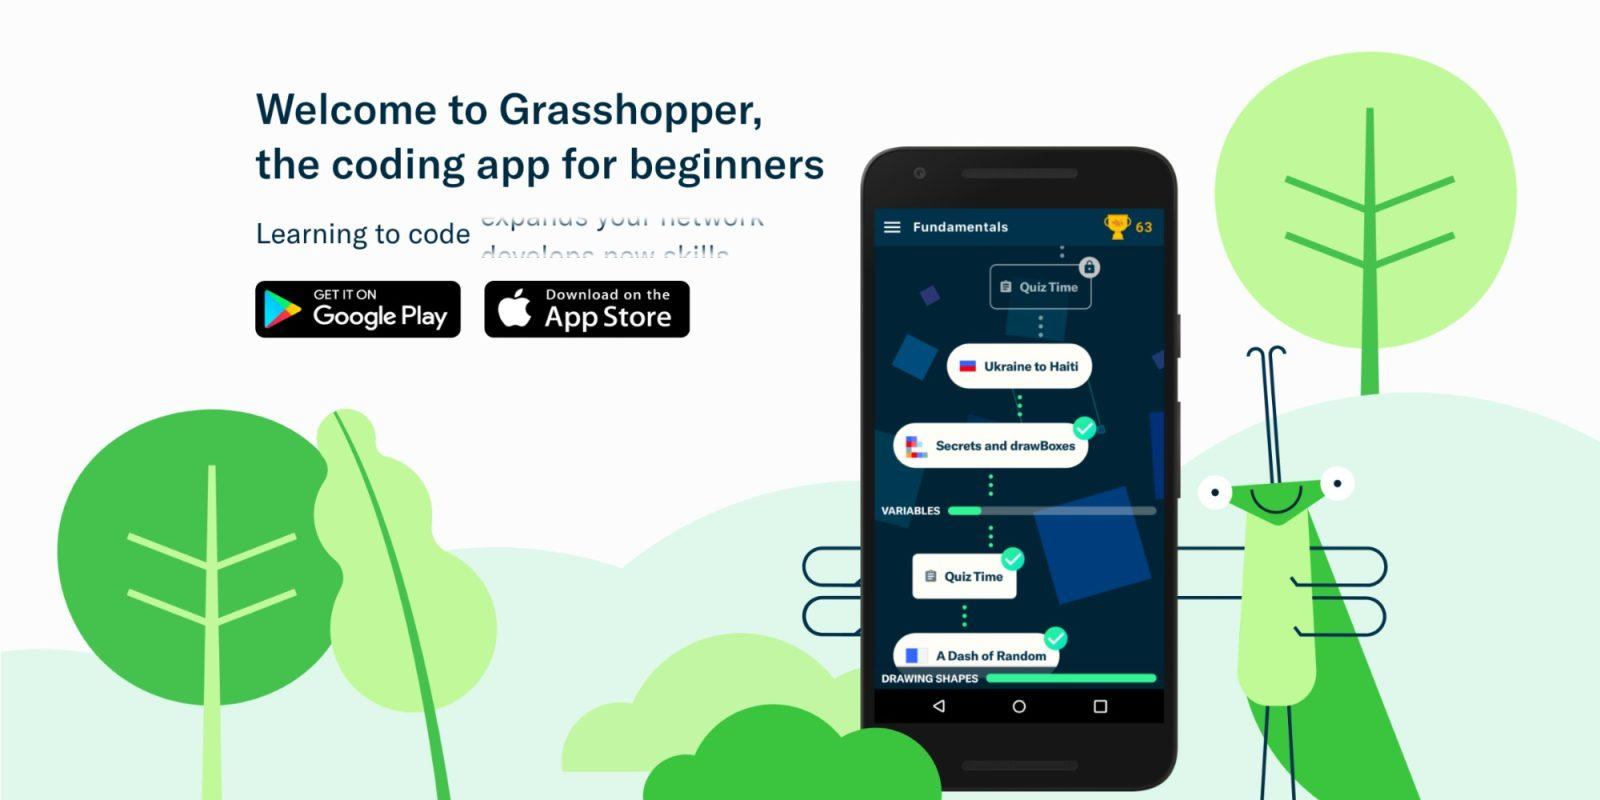 grasshopper-app-business-productivity-tips-advice-smartphone-entrepreneur-teamwork-scheduling